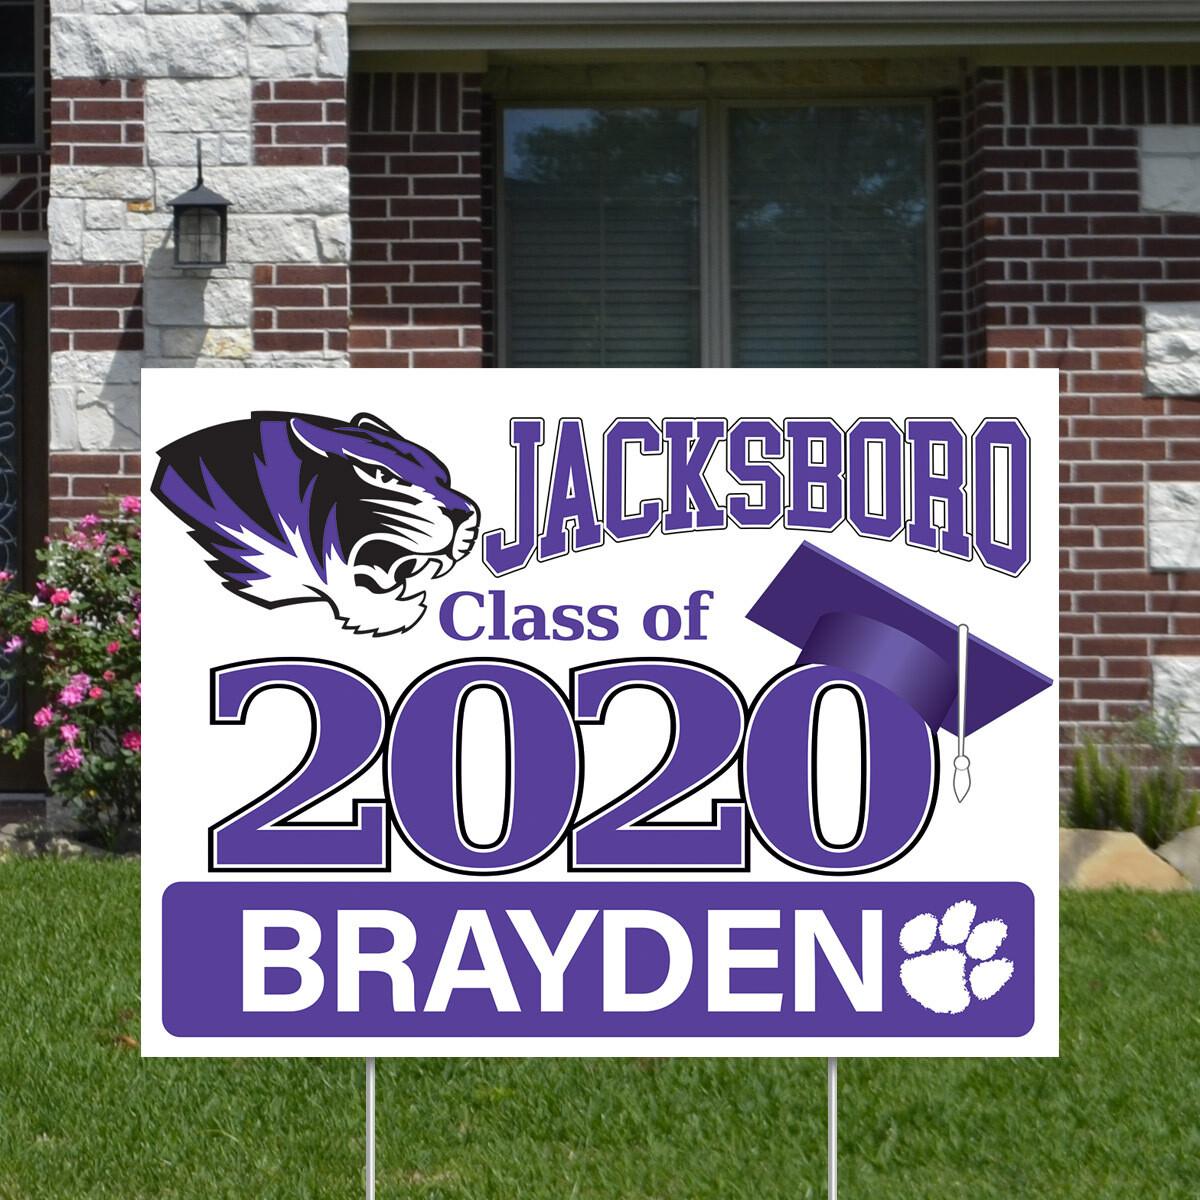 Jacksboro High School (4 styles)